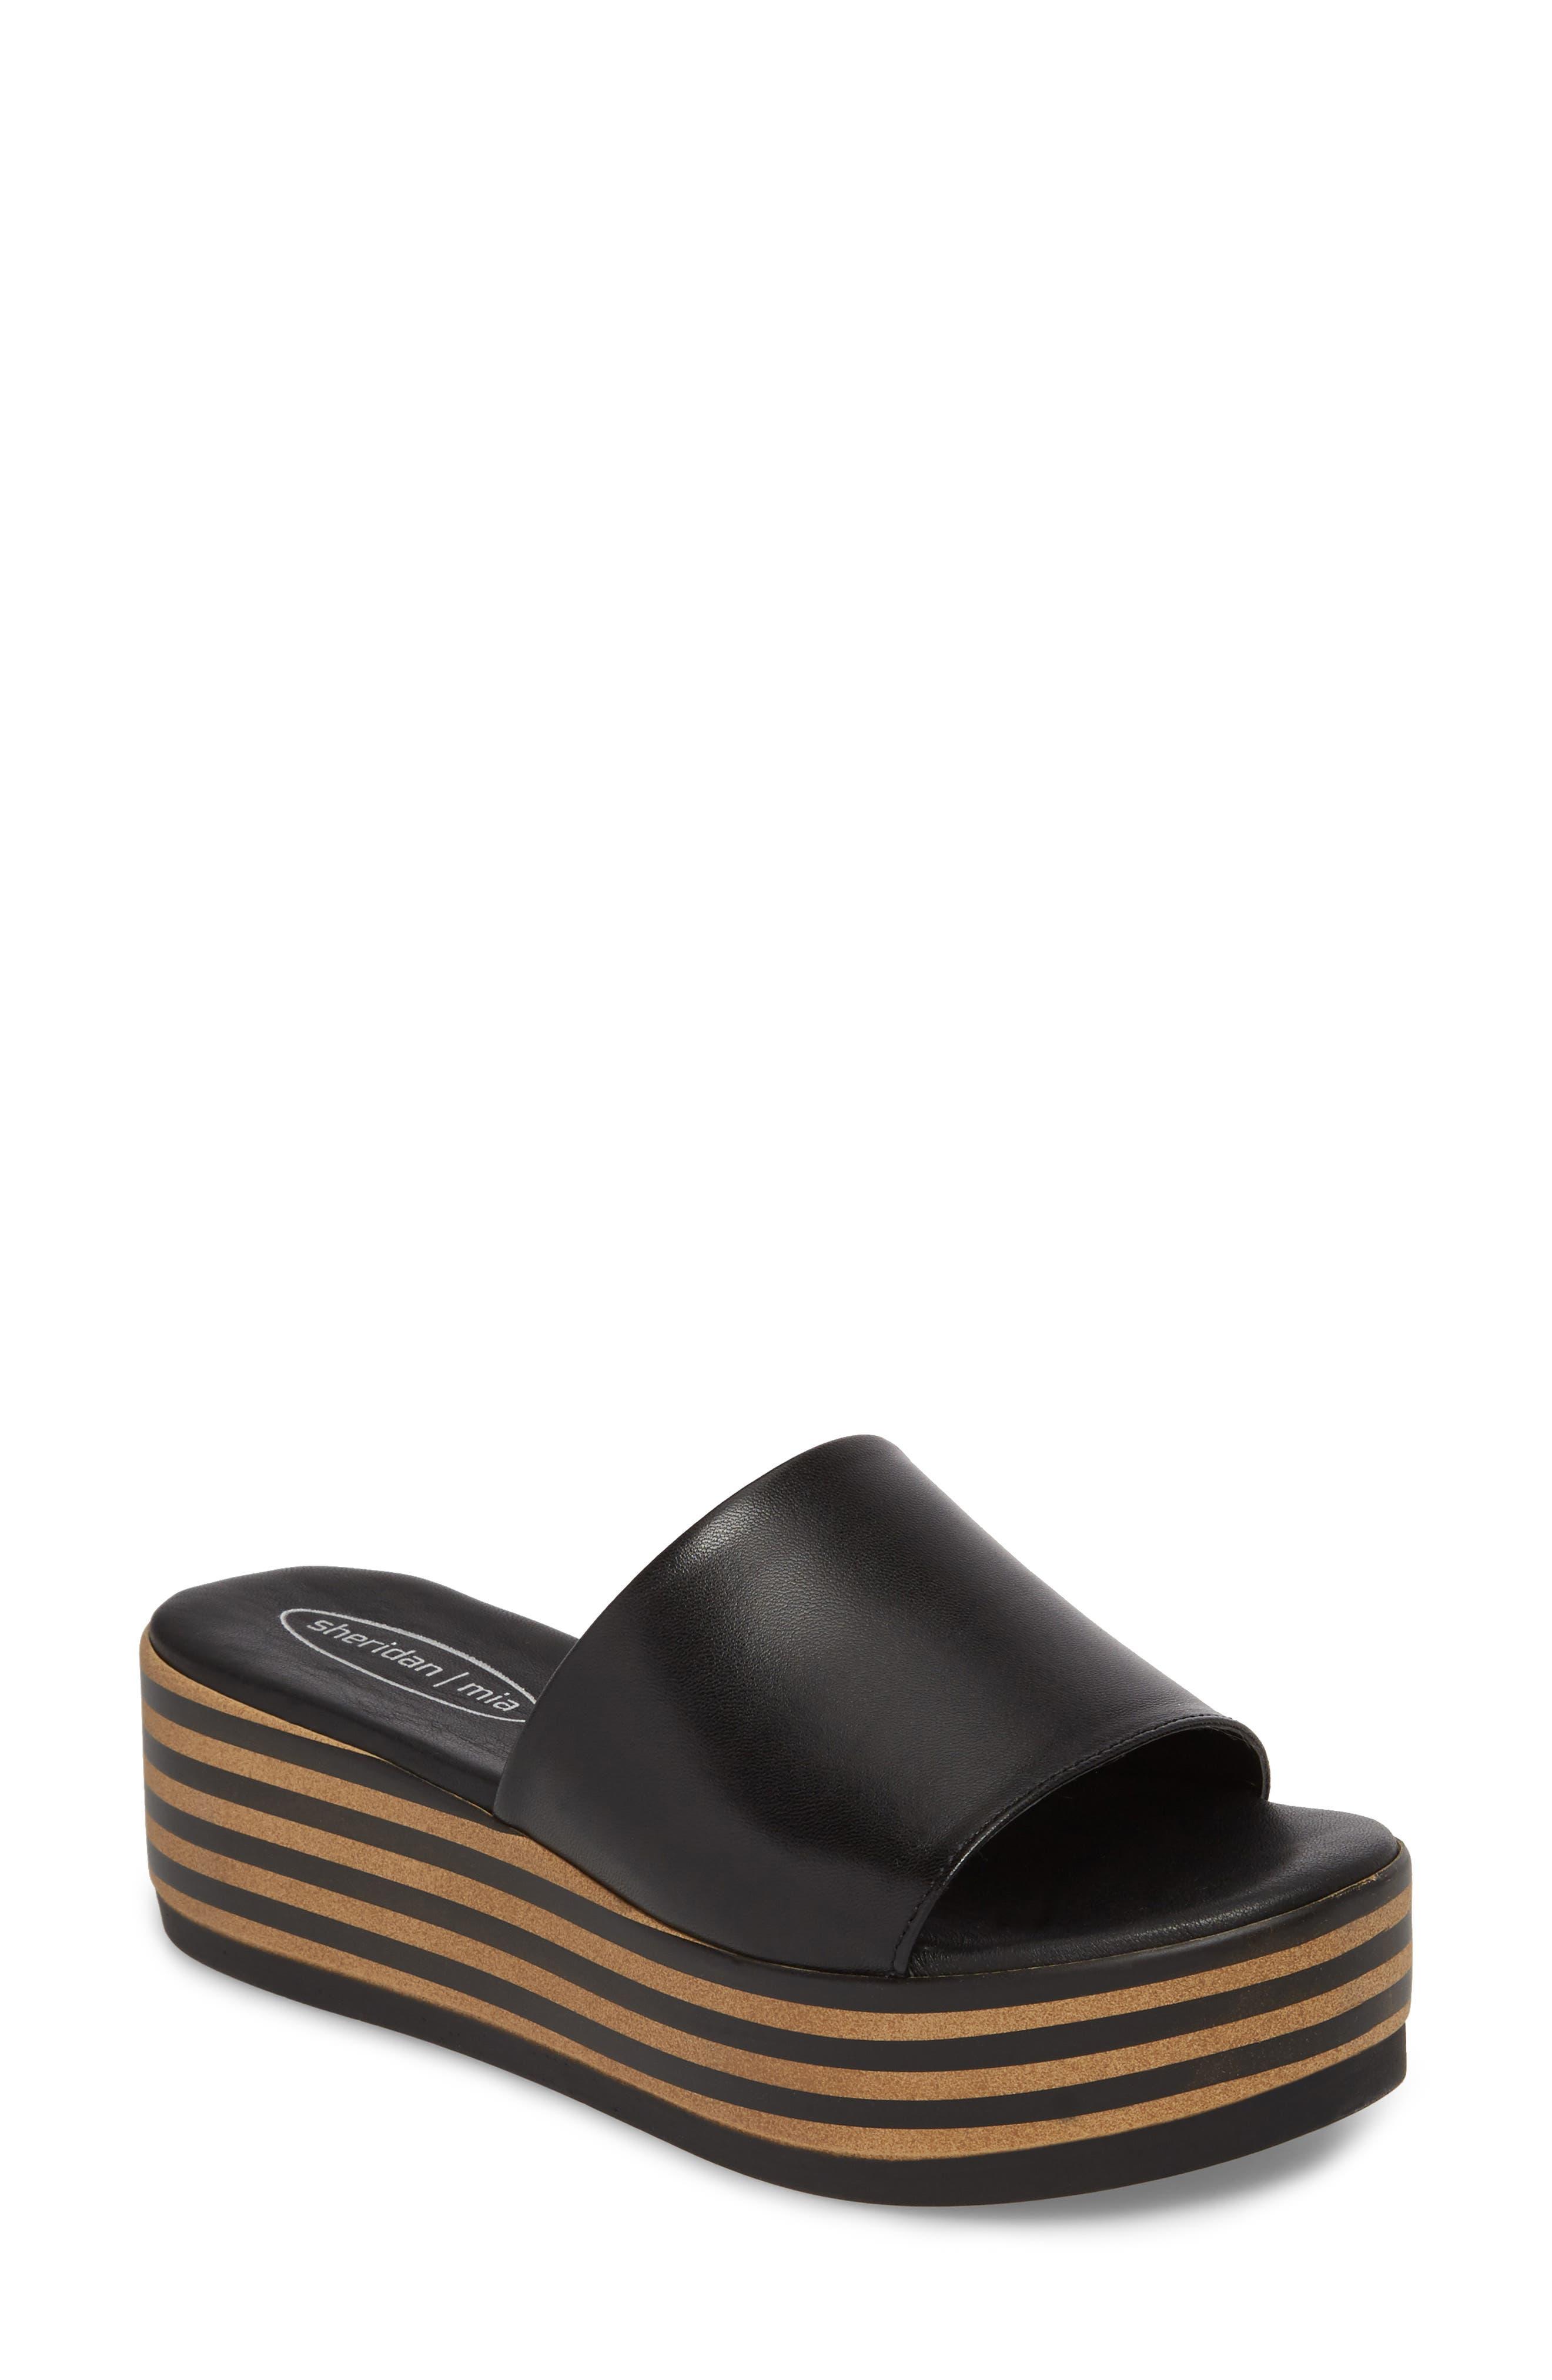 Reesa Platform Slide Sandal,                             Main thumbnail 1, color,                             Black Leather